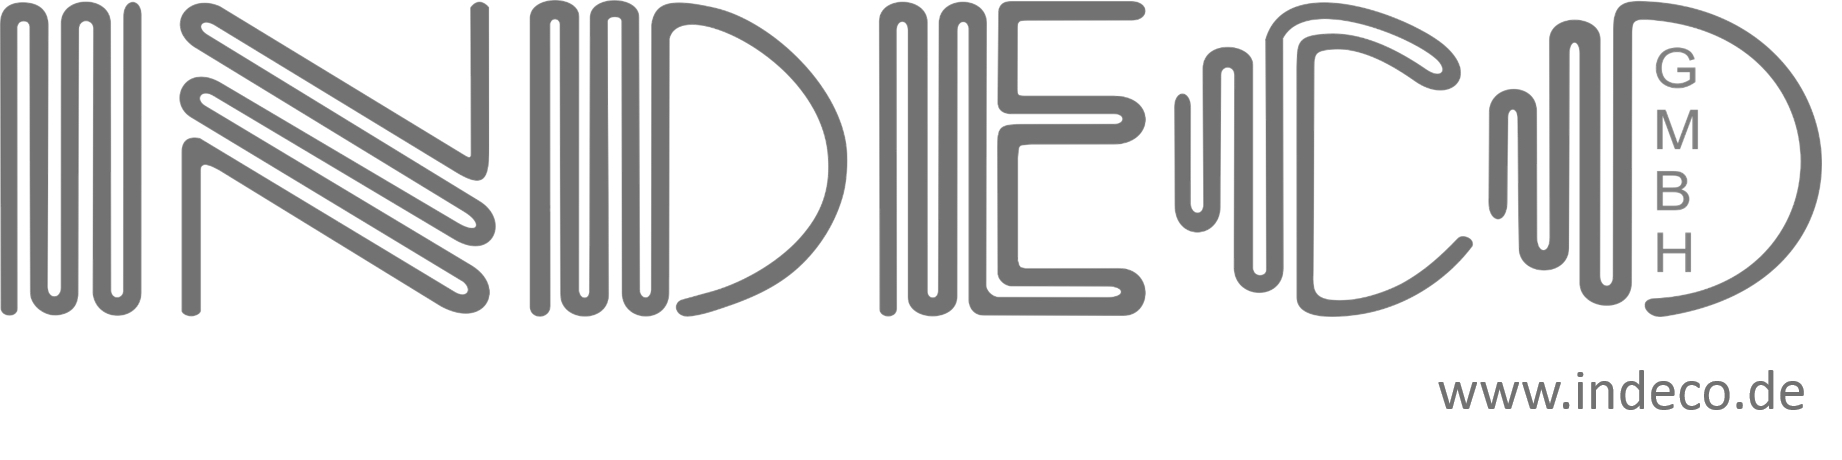 Logo INDECO GmbH